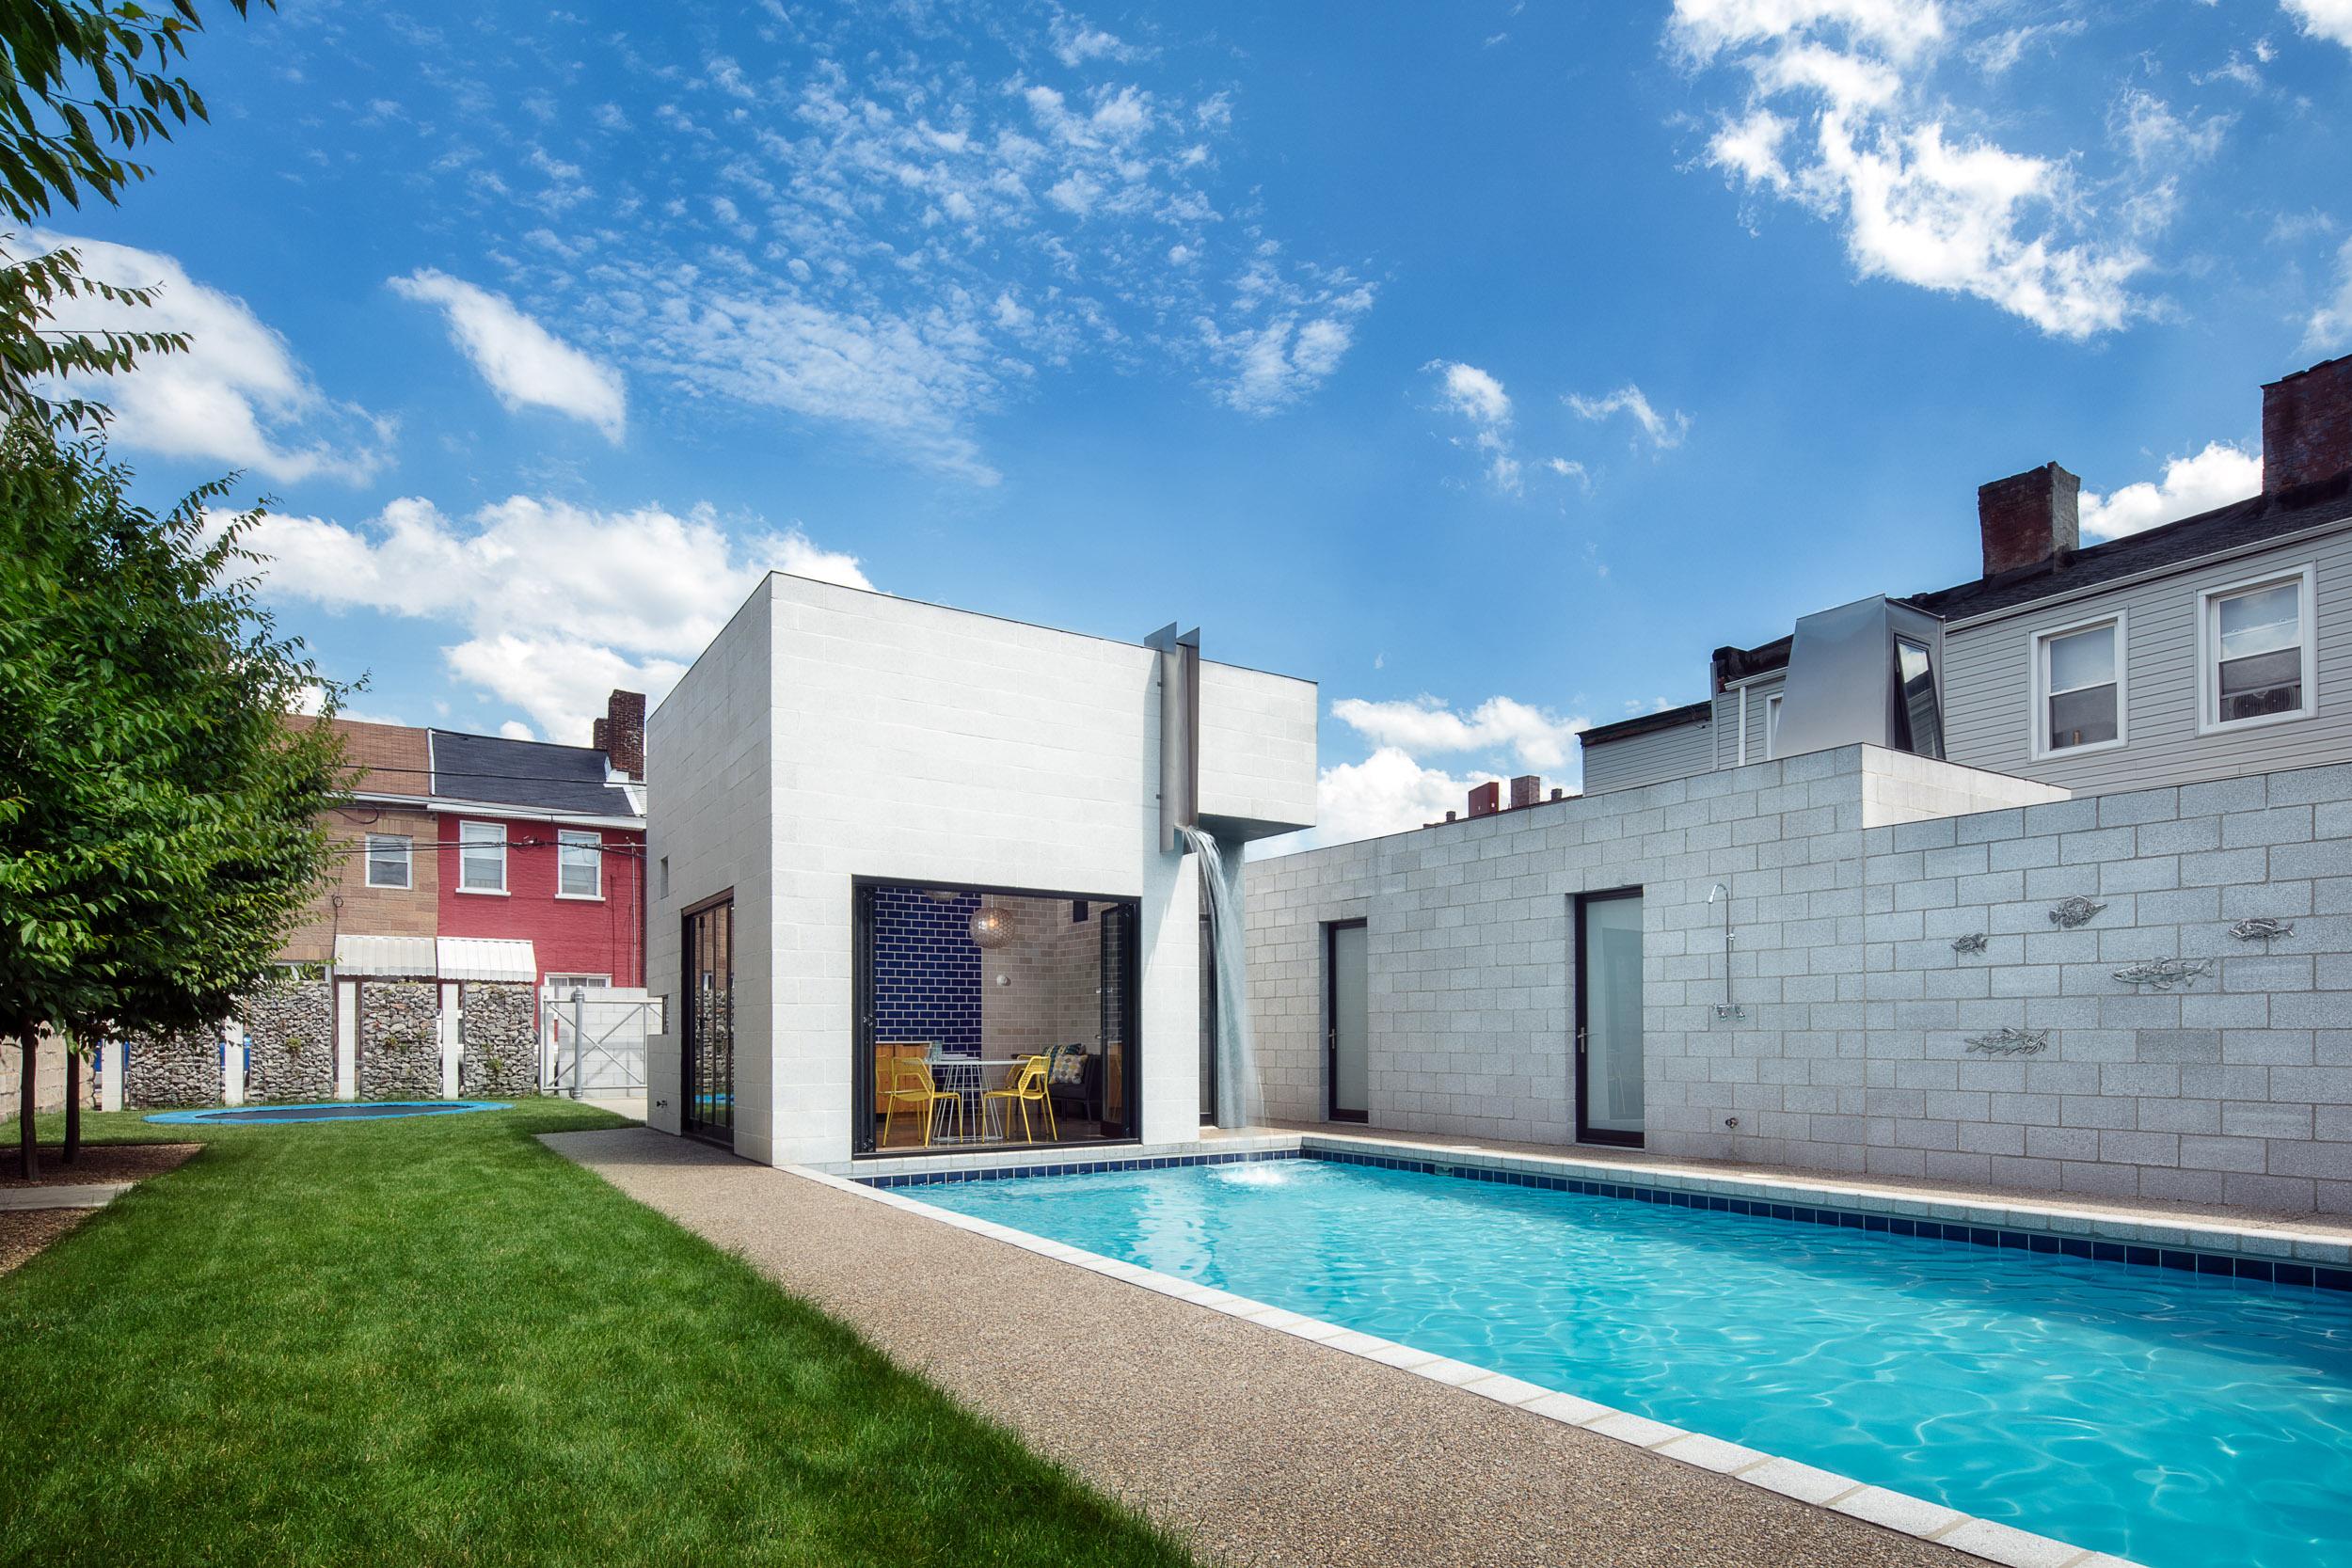 pool_pavilion_pittsburgh_design_poolhouse-7.jpg